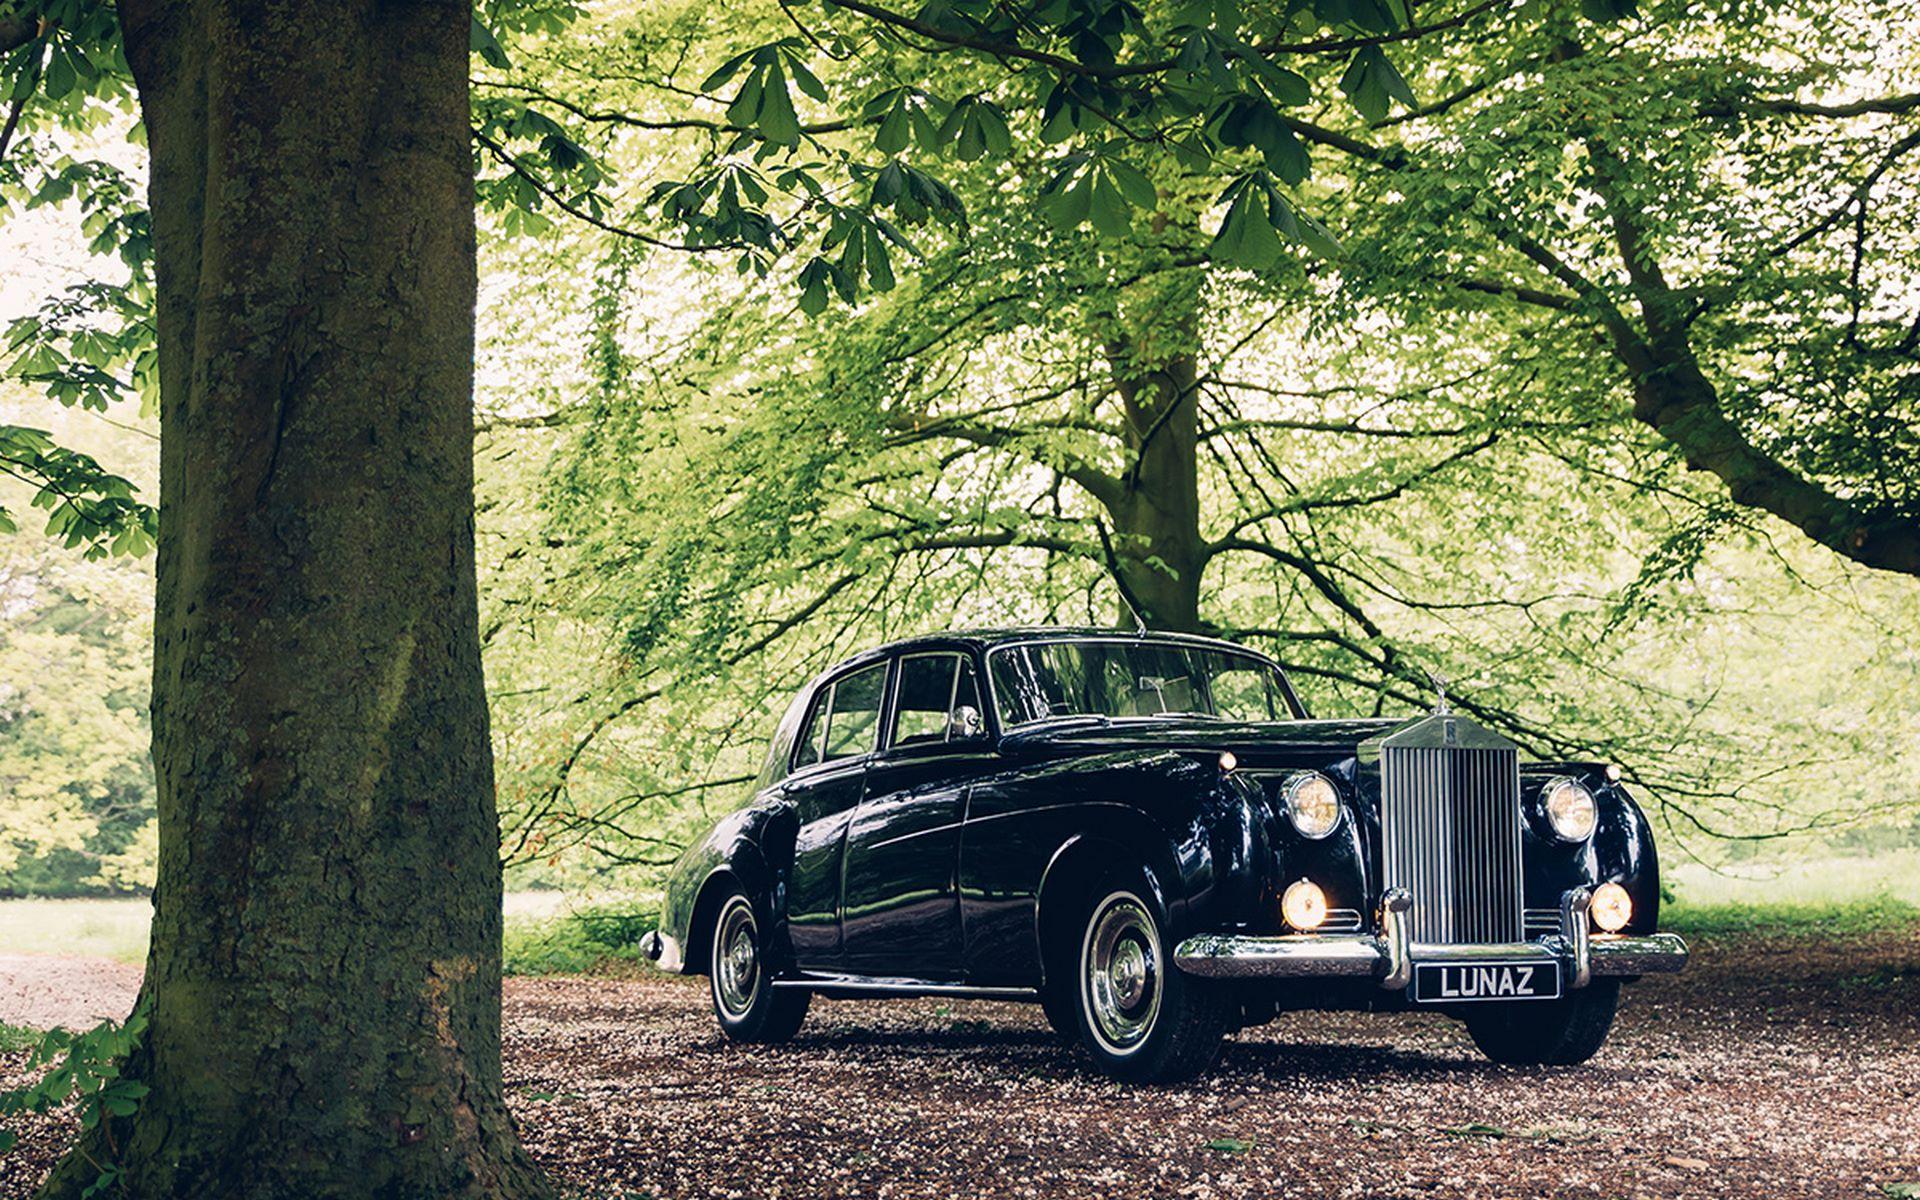 Electris-Rolls-Royce-Phantom-V-and-Silver-Cloud-by-Lunaz-14